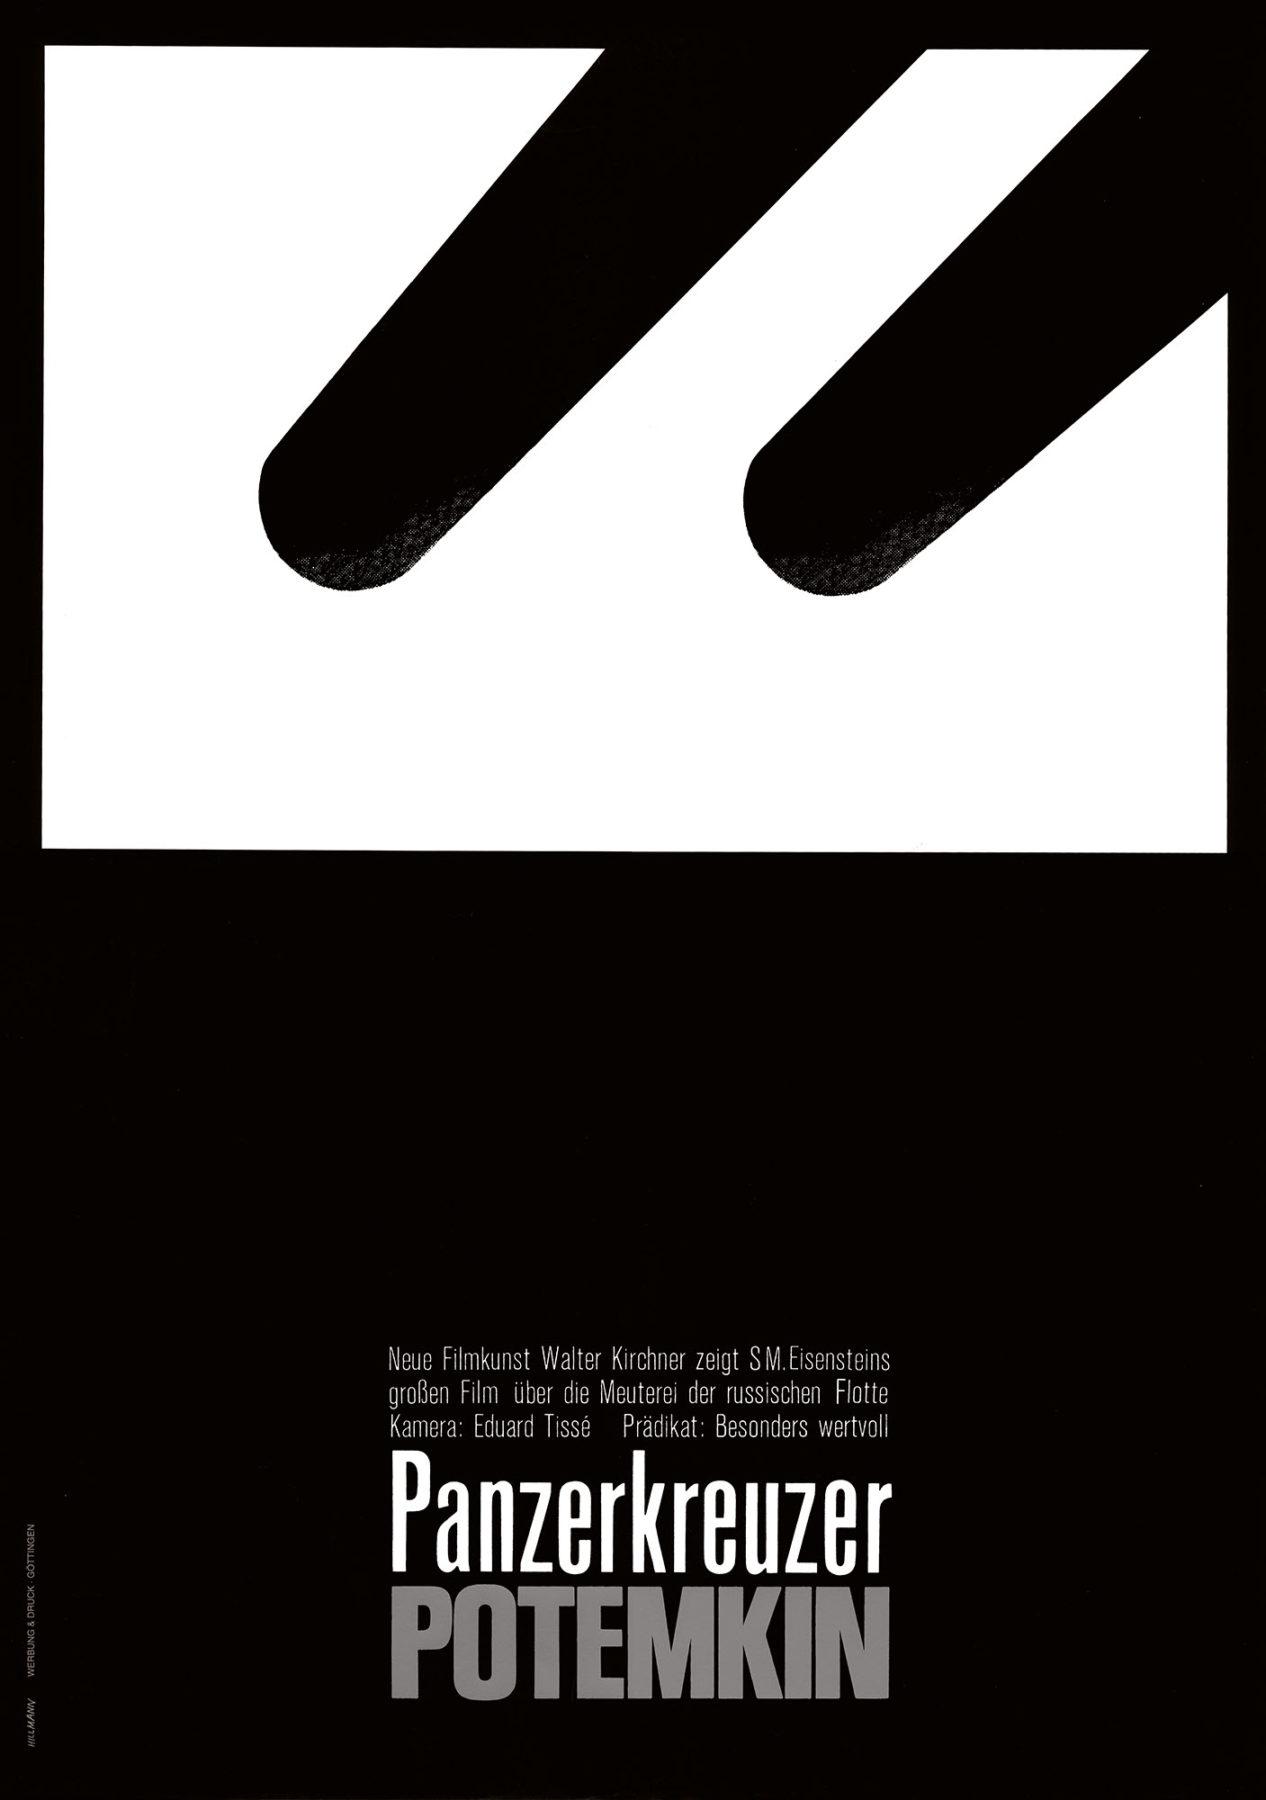 Hillmann 1966 Panzerkreuzer Potemkin Neue Filmkunst Walter Kirchner Plakat A1